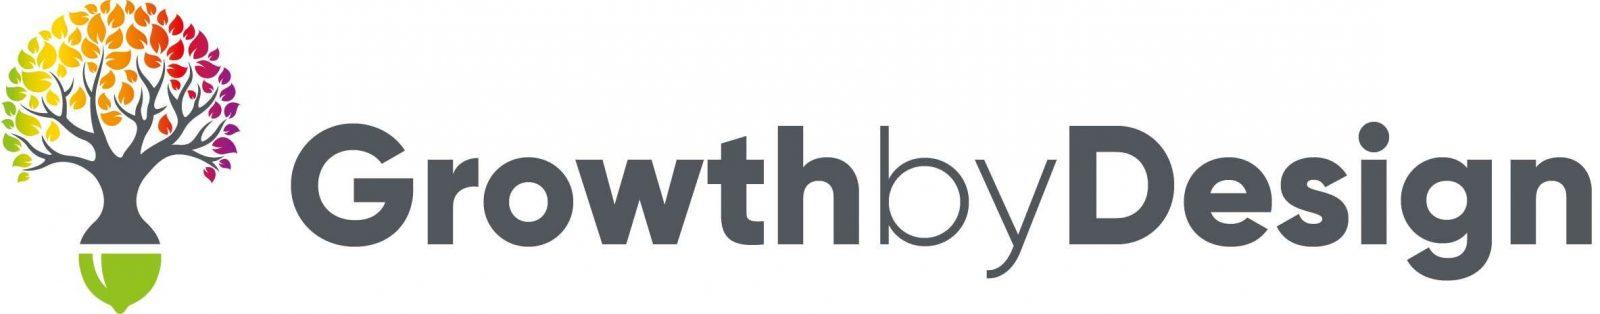 Growth by Design logo